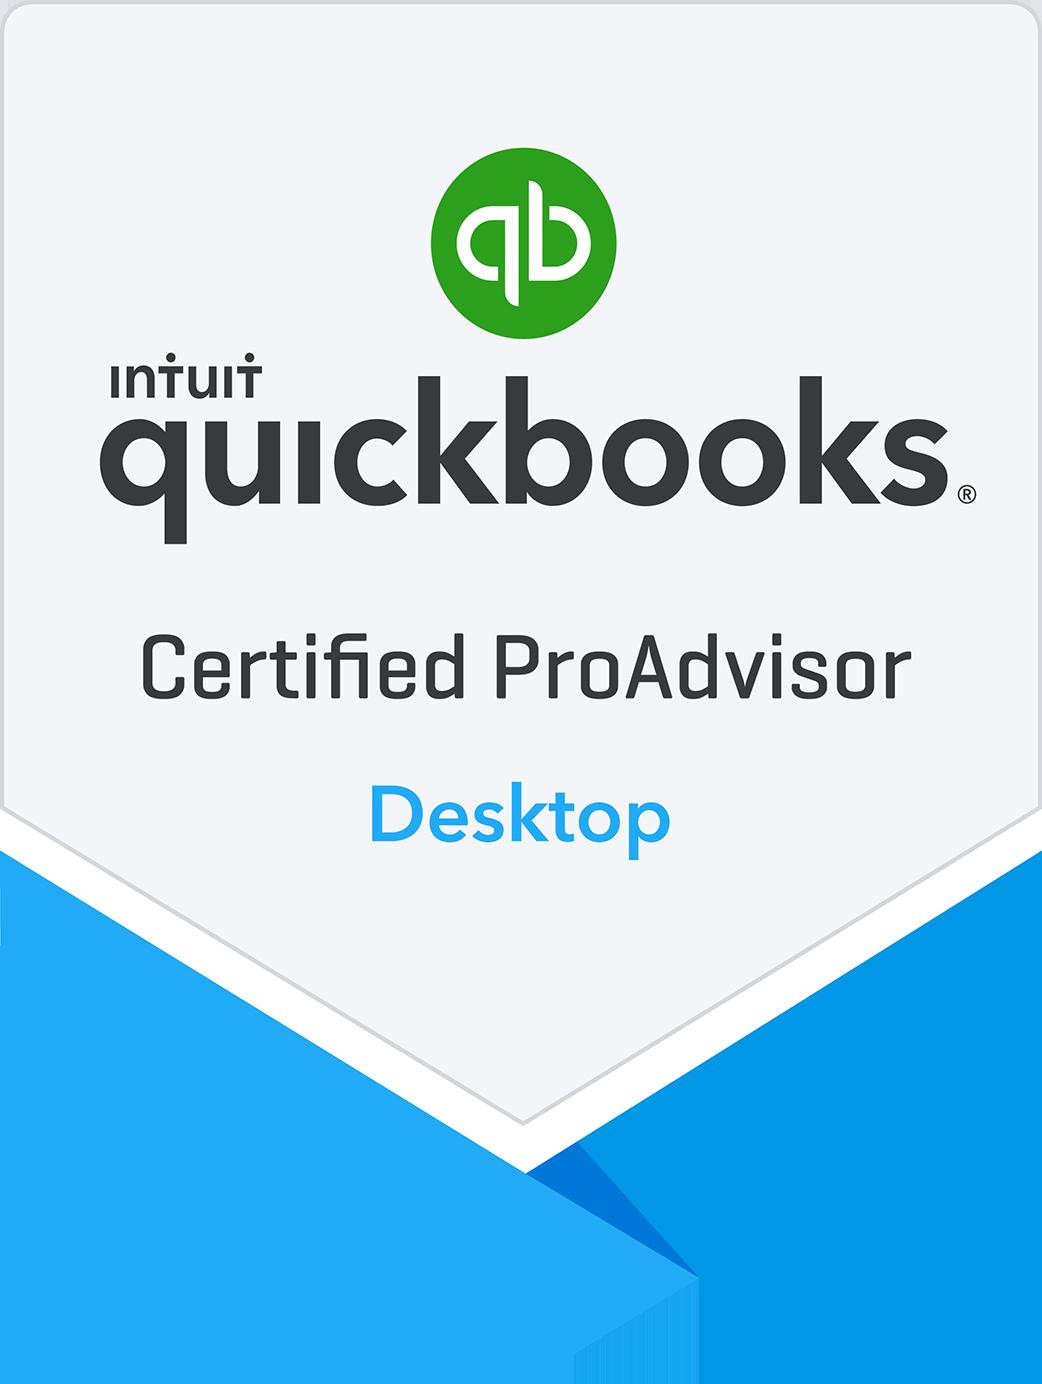 Certified QuickBooks Desktop ProAdvisor